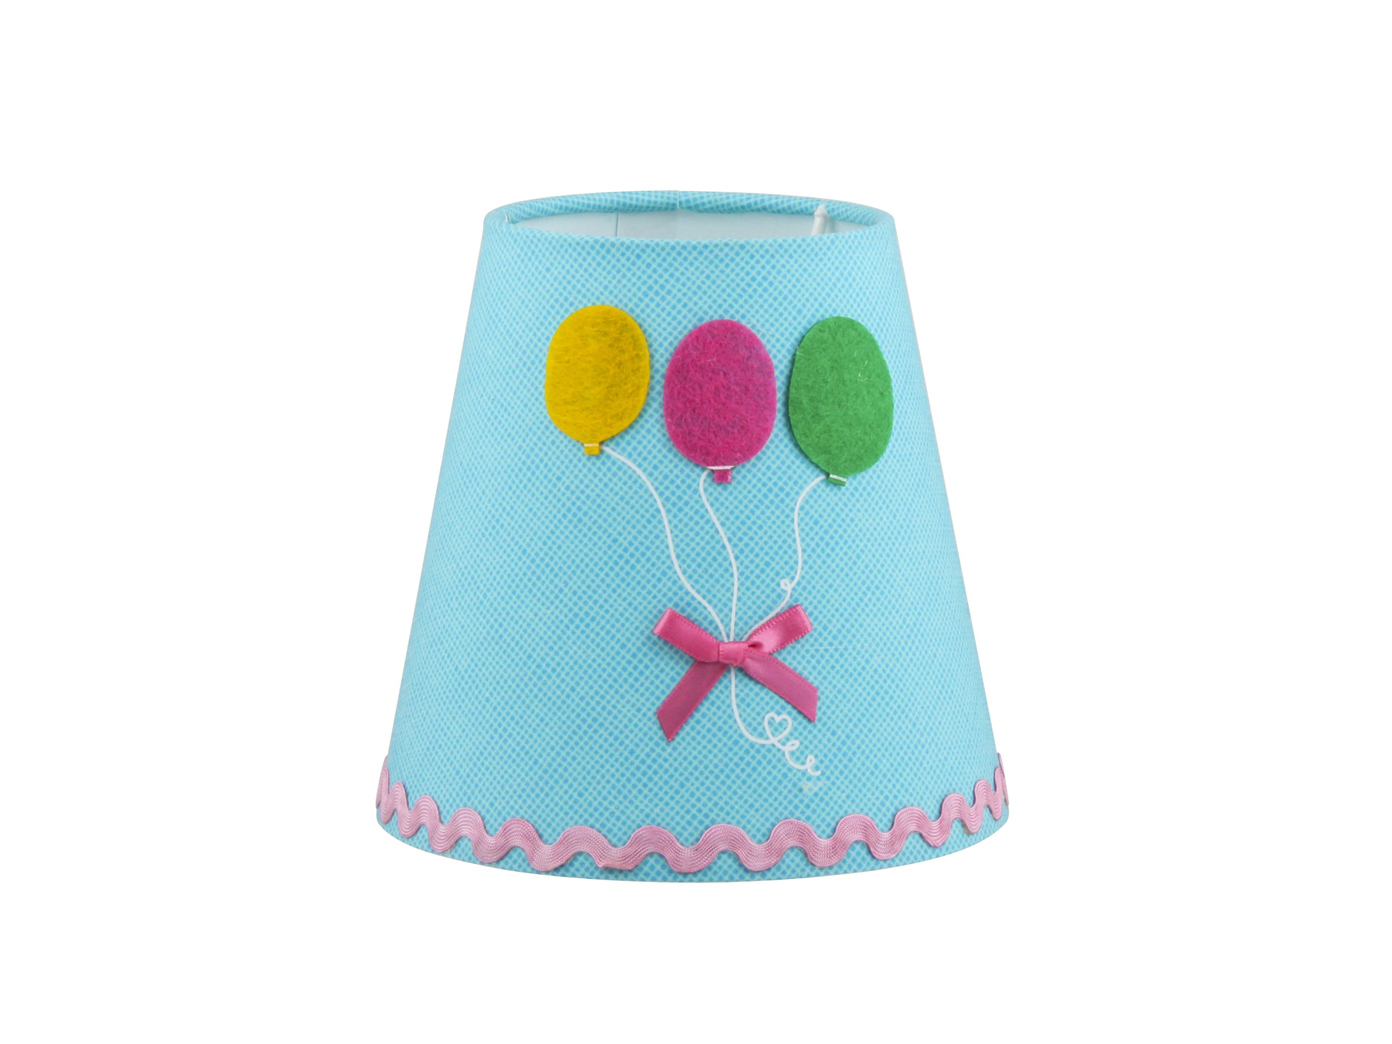 kronleuchter mit rosa bunten lampenschirmen kinderzimmerlampen f r m dchen eur 99 99. Black Bedroom Furniture Sets. Home Design Ideas